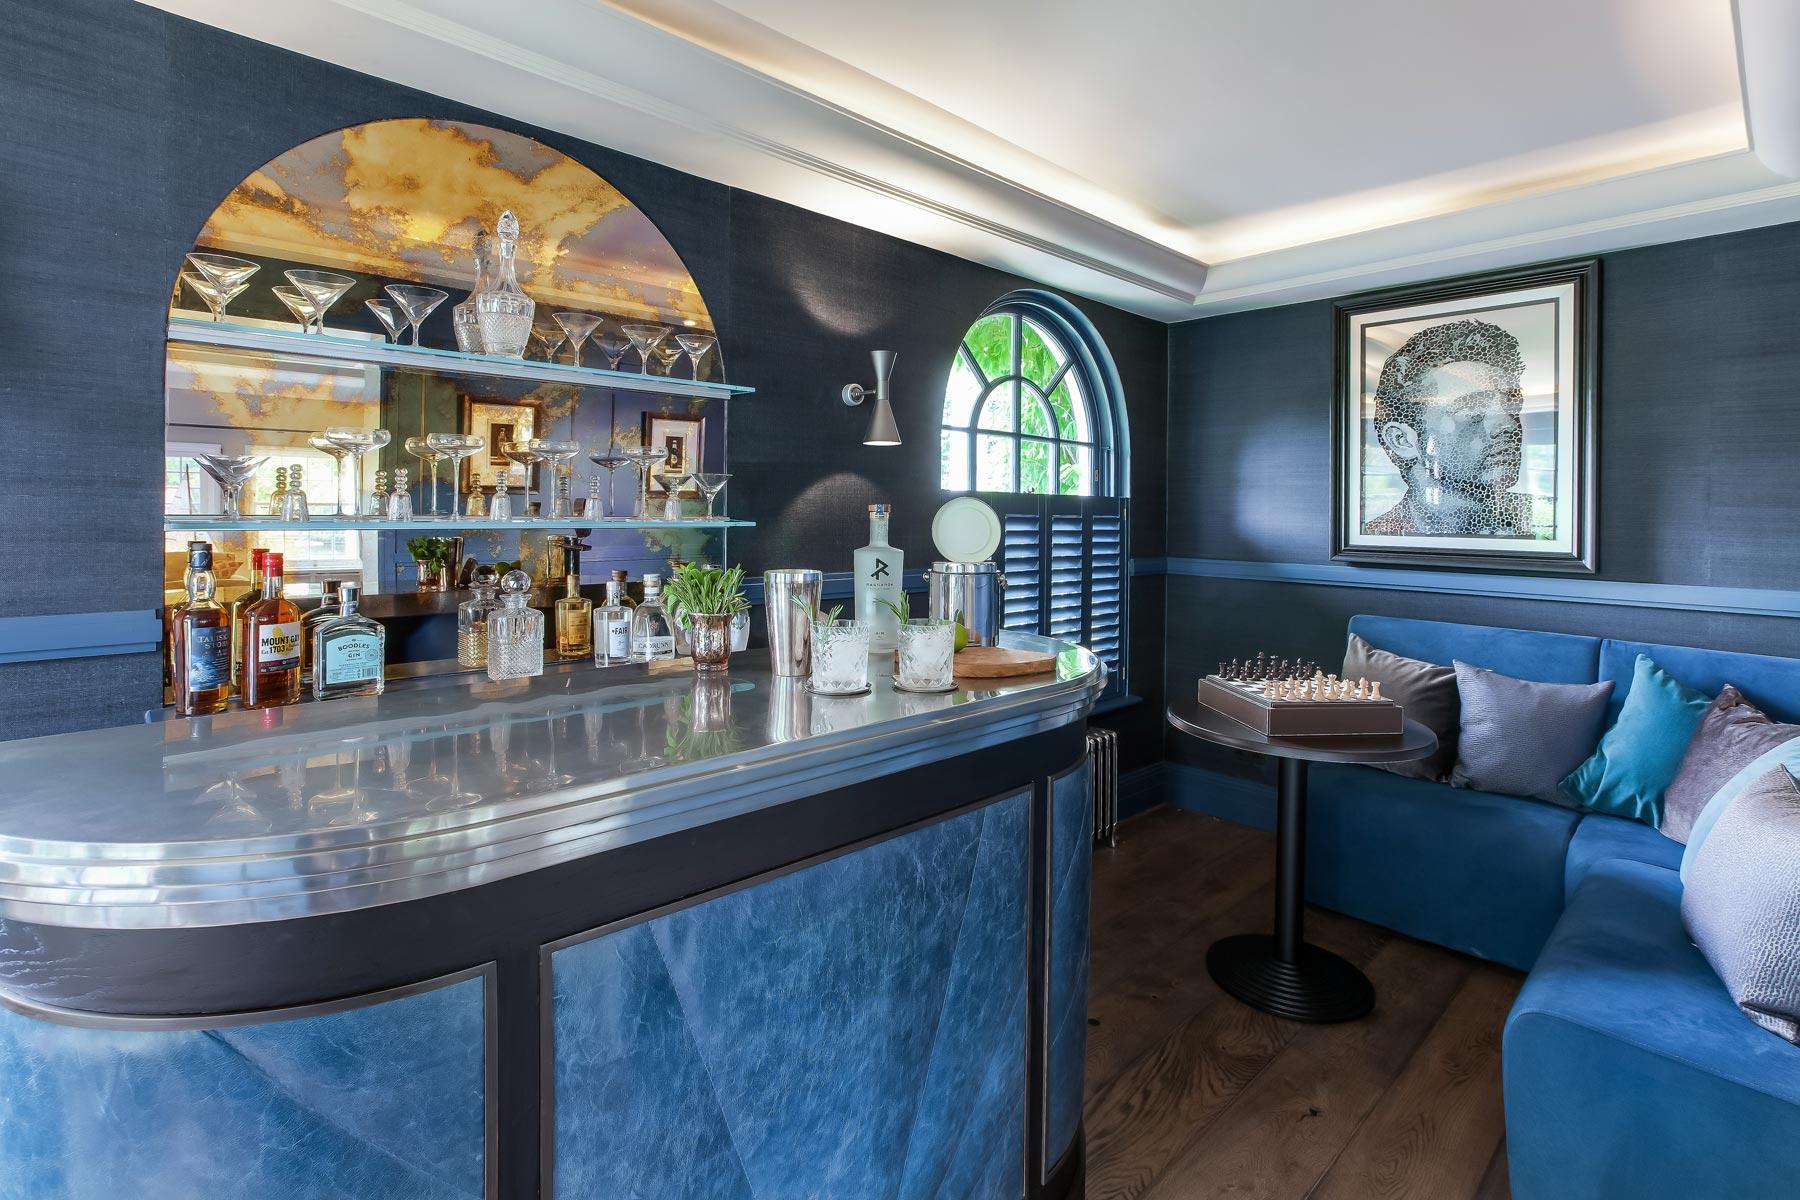 Mark Taylor Design Draws Inspiration From The Berkeley Hotel's Blue Bar